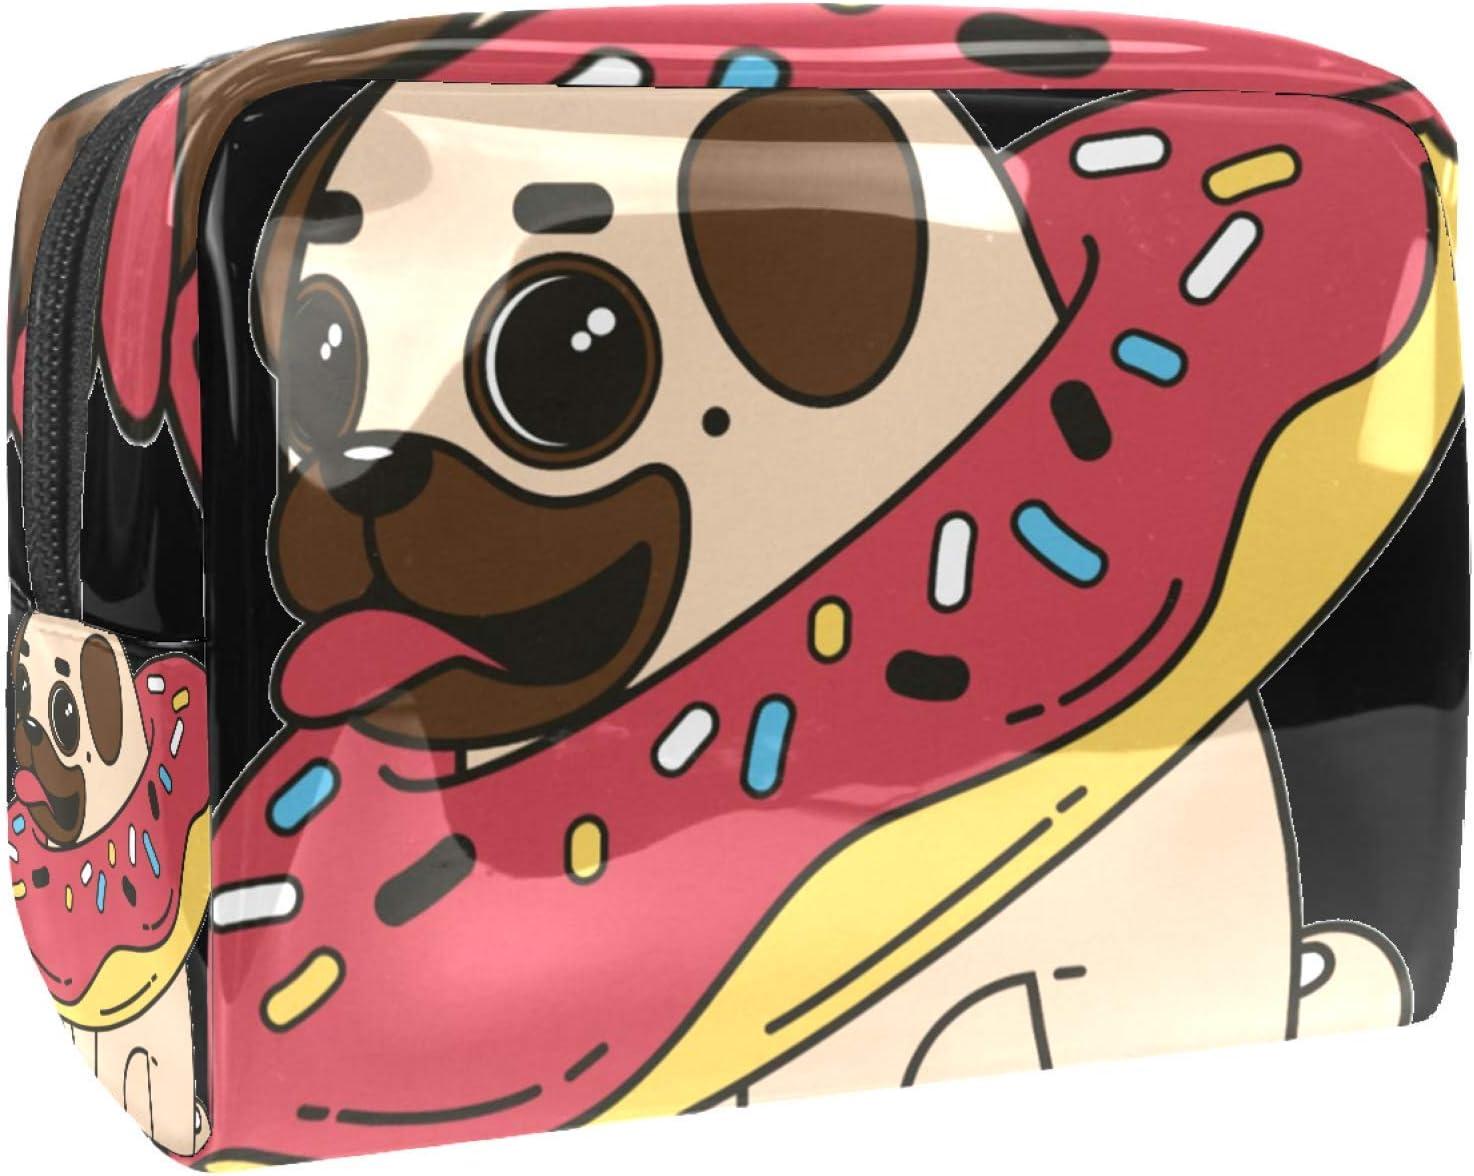 Makeup Bag Las Vegas Mall Portable Travel Pug Women High quality new dog Cosmetic Beauty for